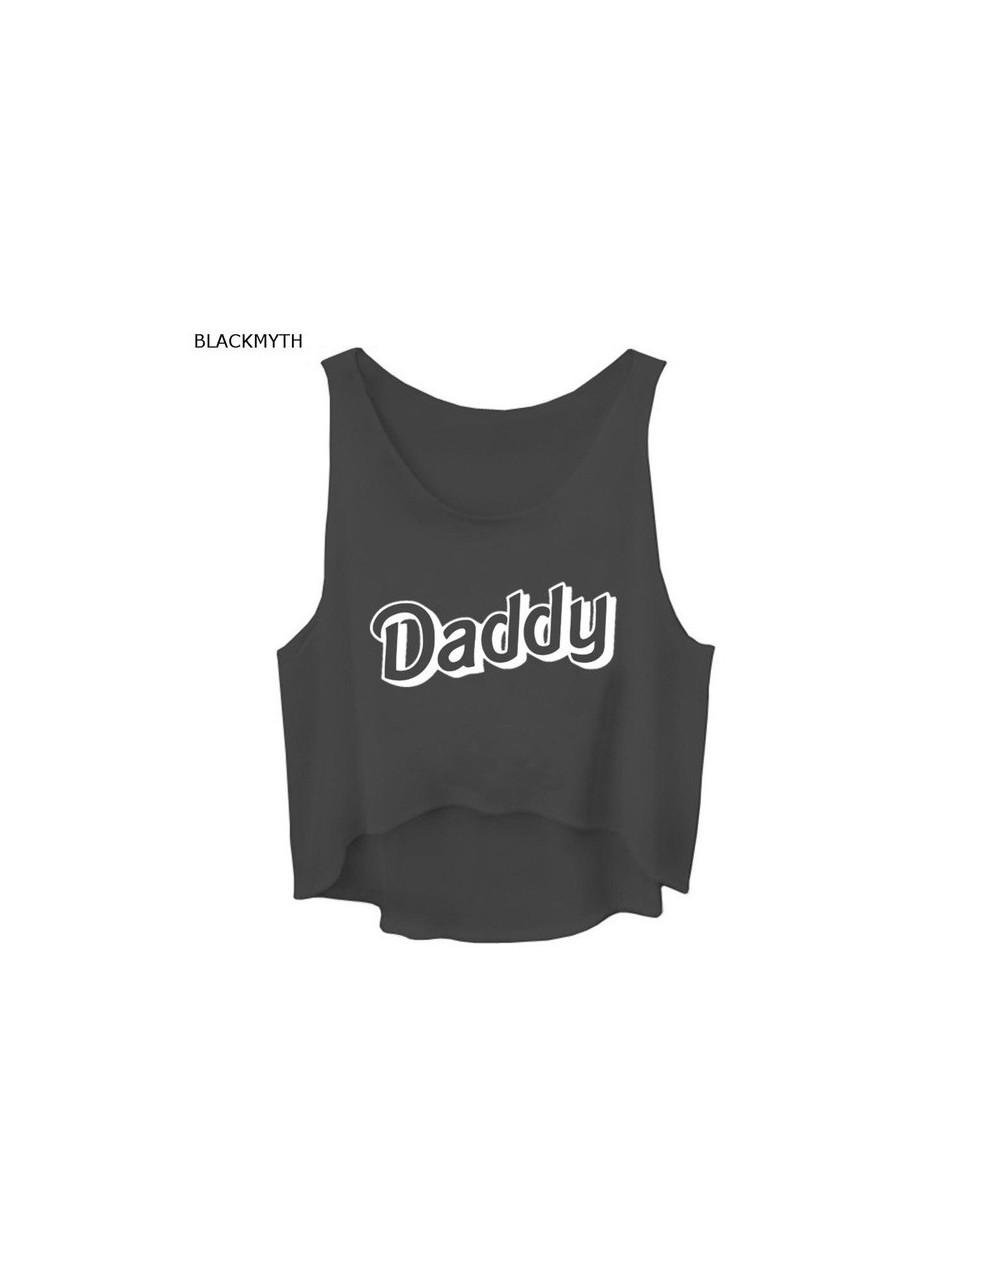 Women Tank Top Crop DADDY Letters Print Sleeveless Beach Vest - Black - 4Q3806077226-1